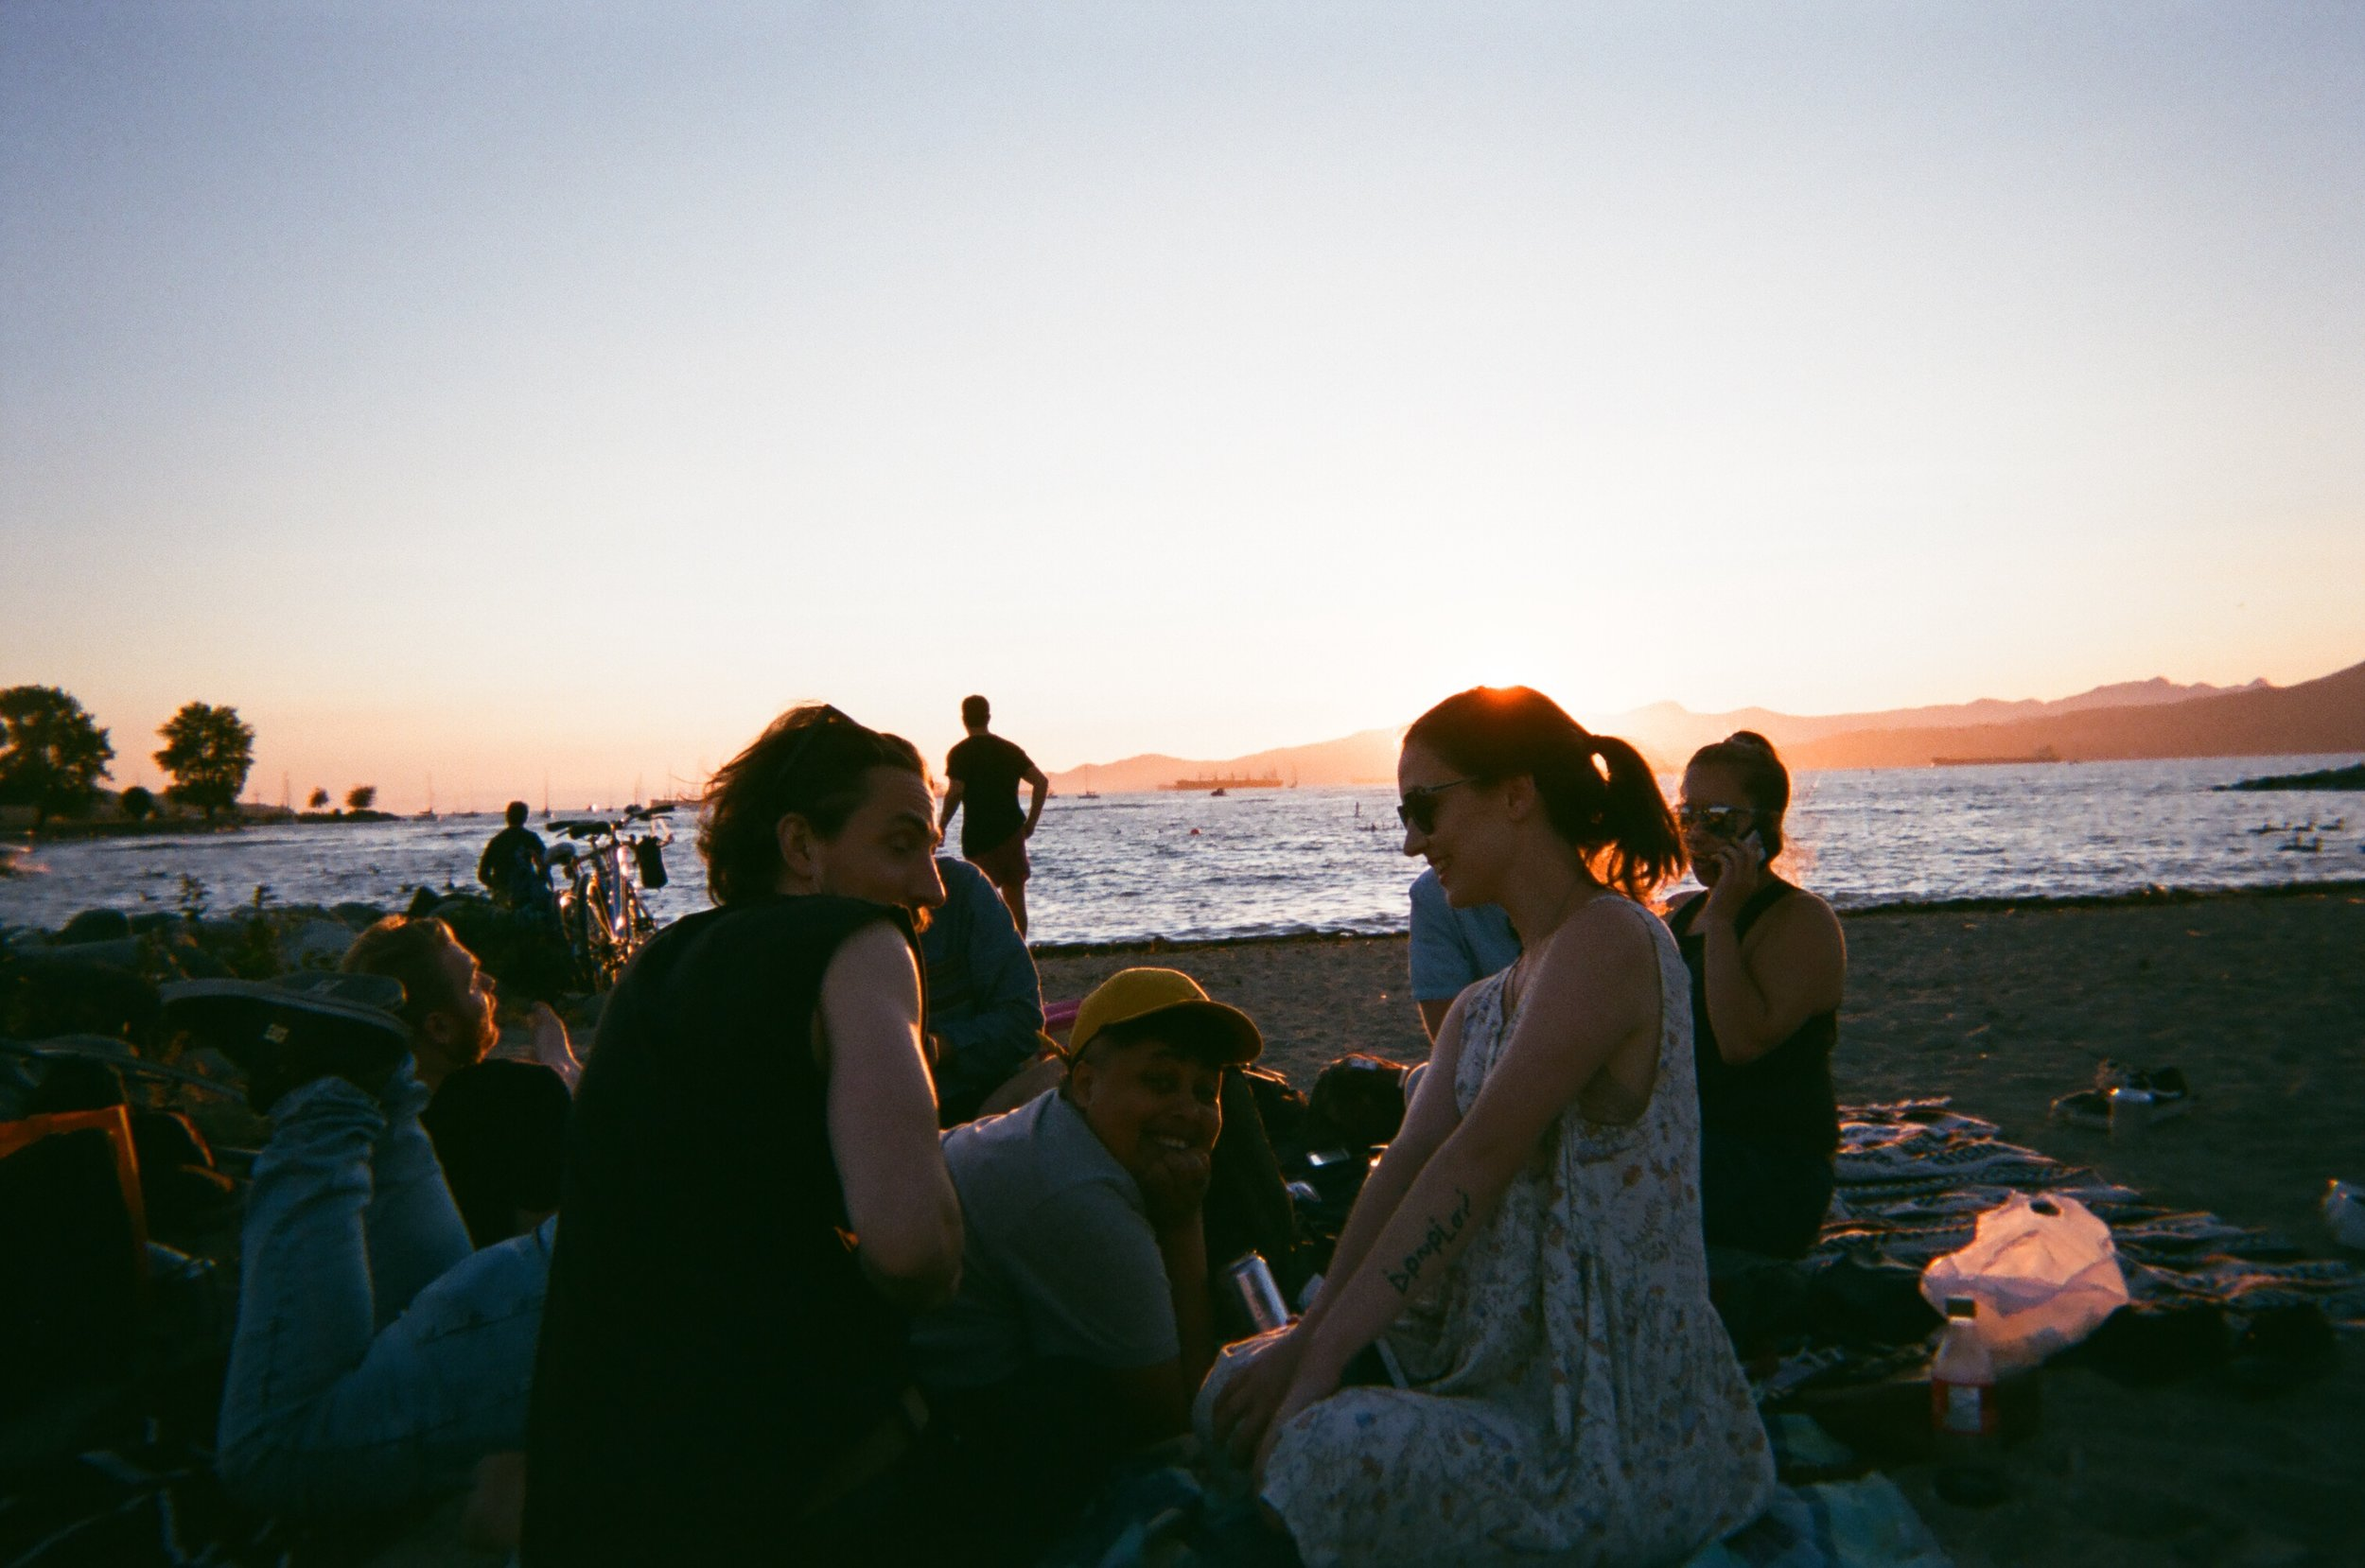 beach photo.jpeg